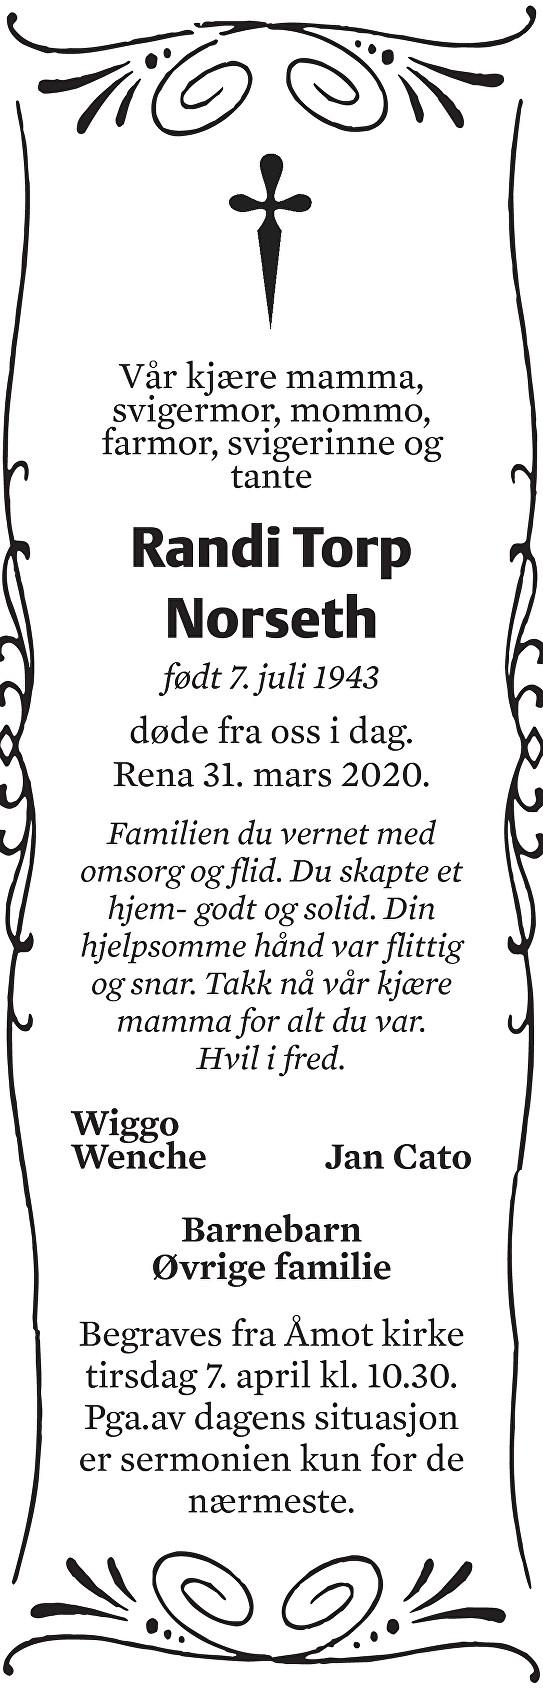 Randi Torp Norseth Dødsannonse